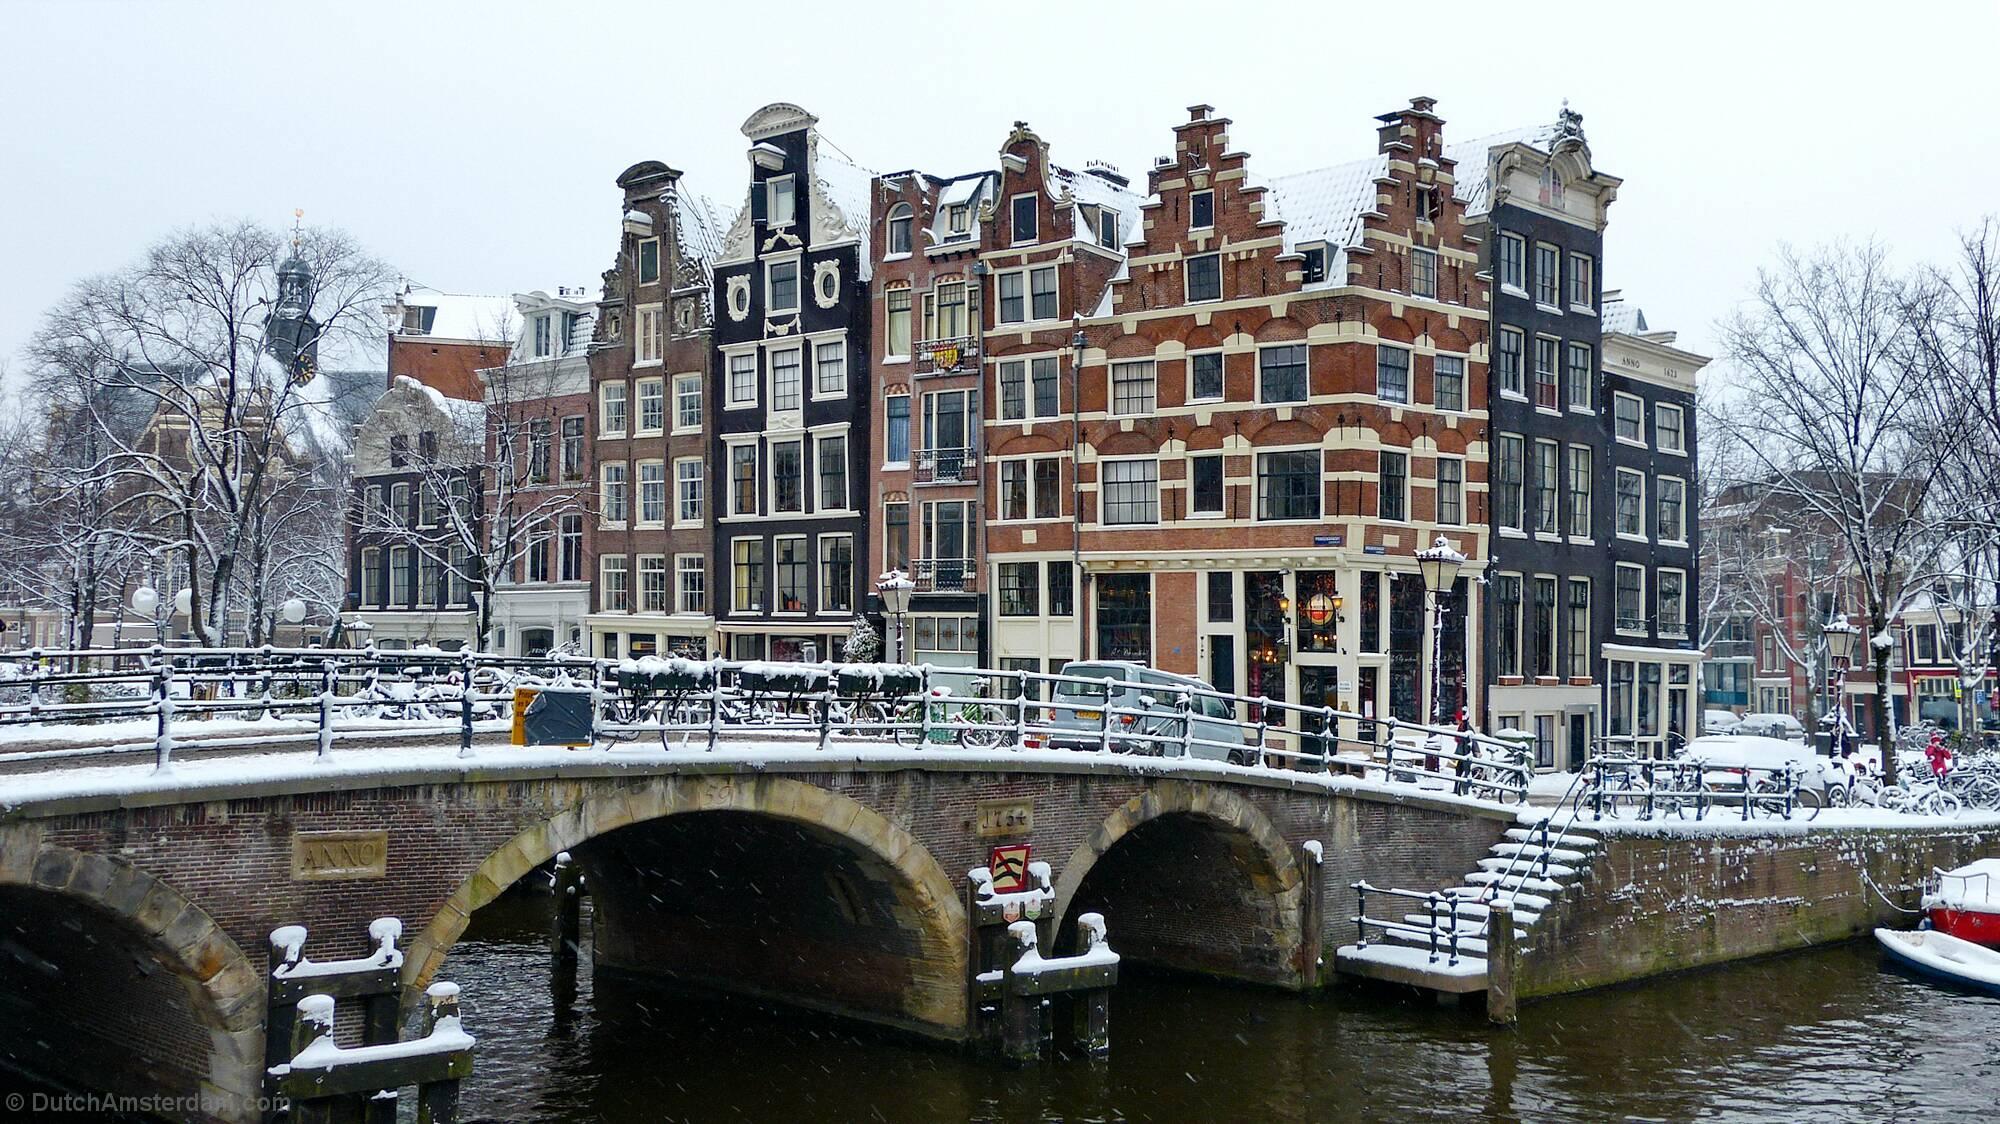 Corner Brouwersgracht, Prinsengracht in Amsterdam